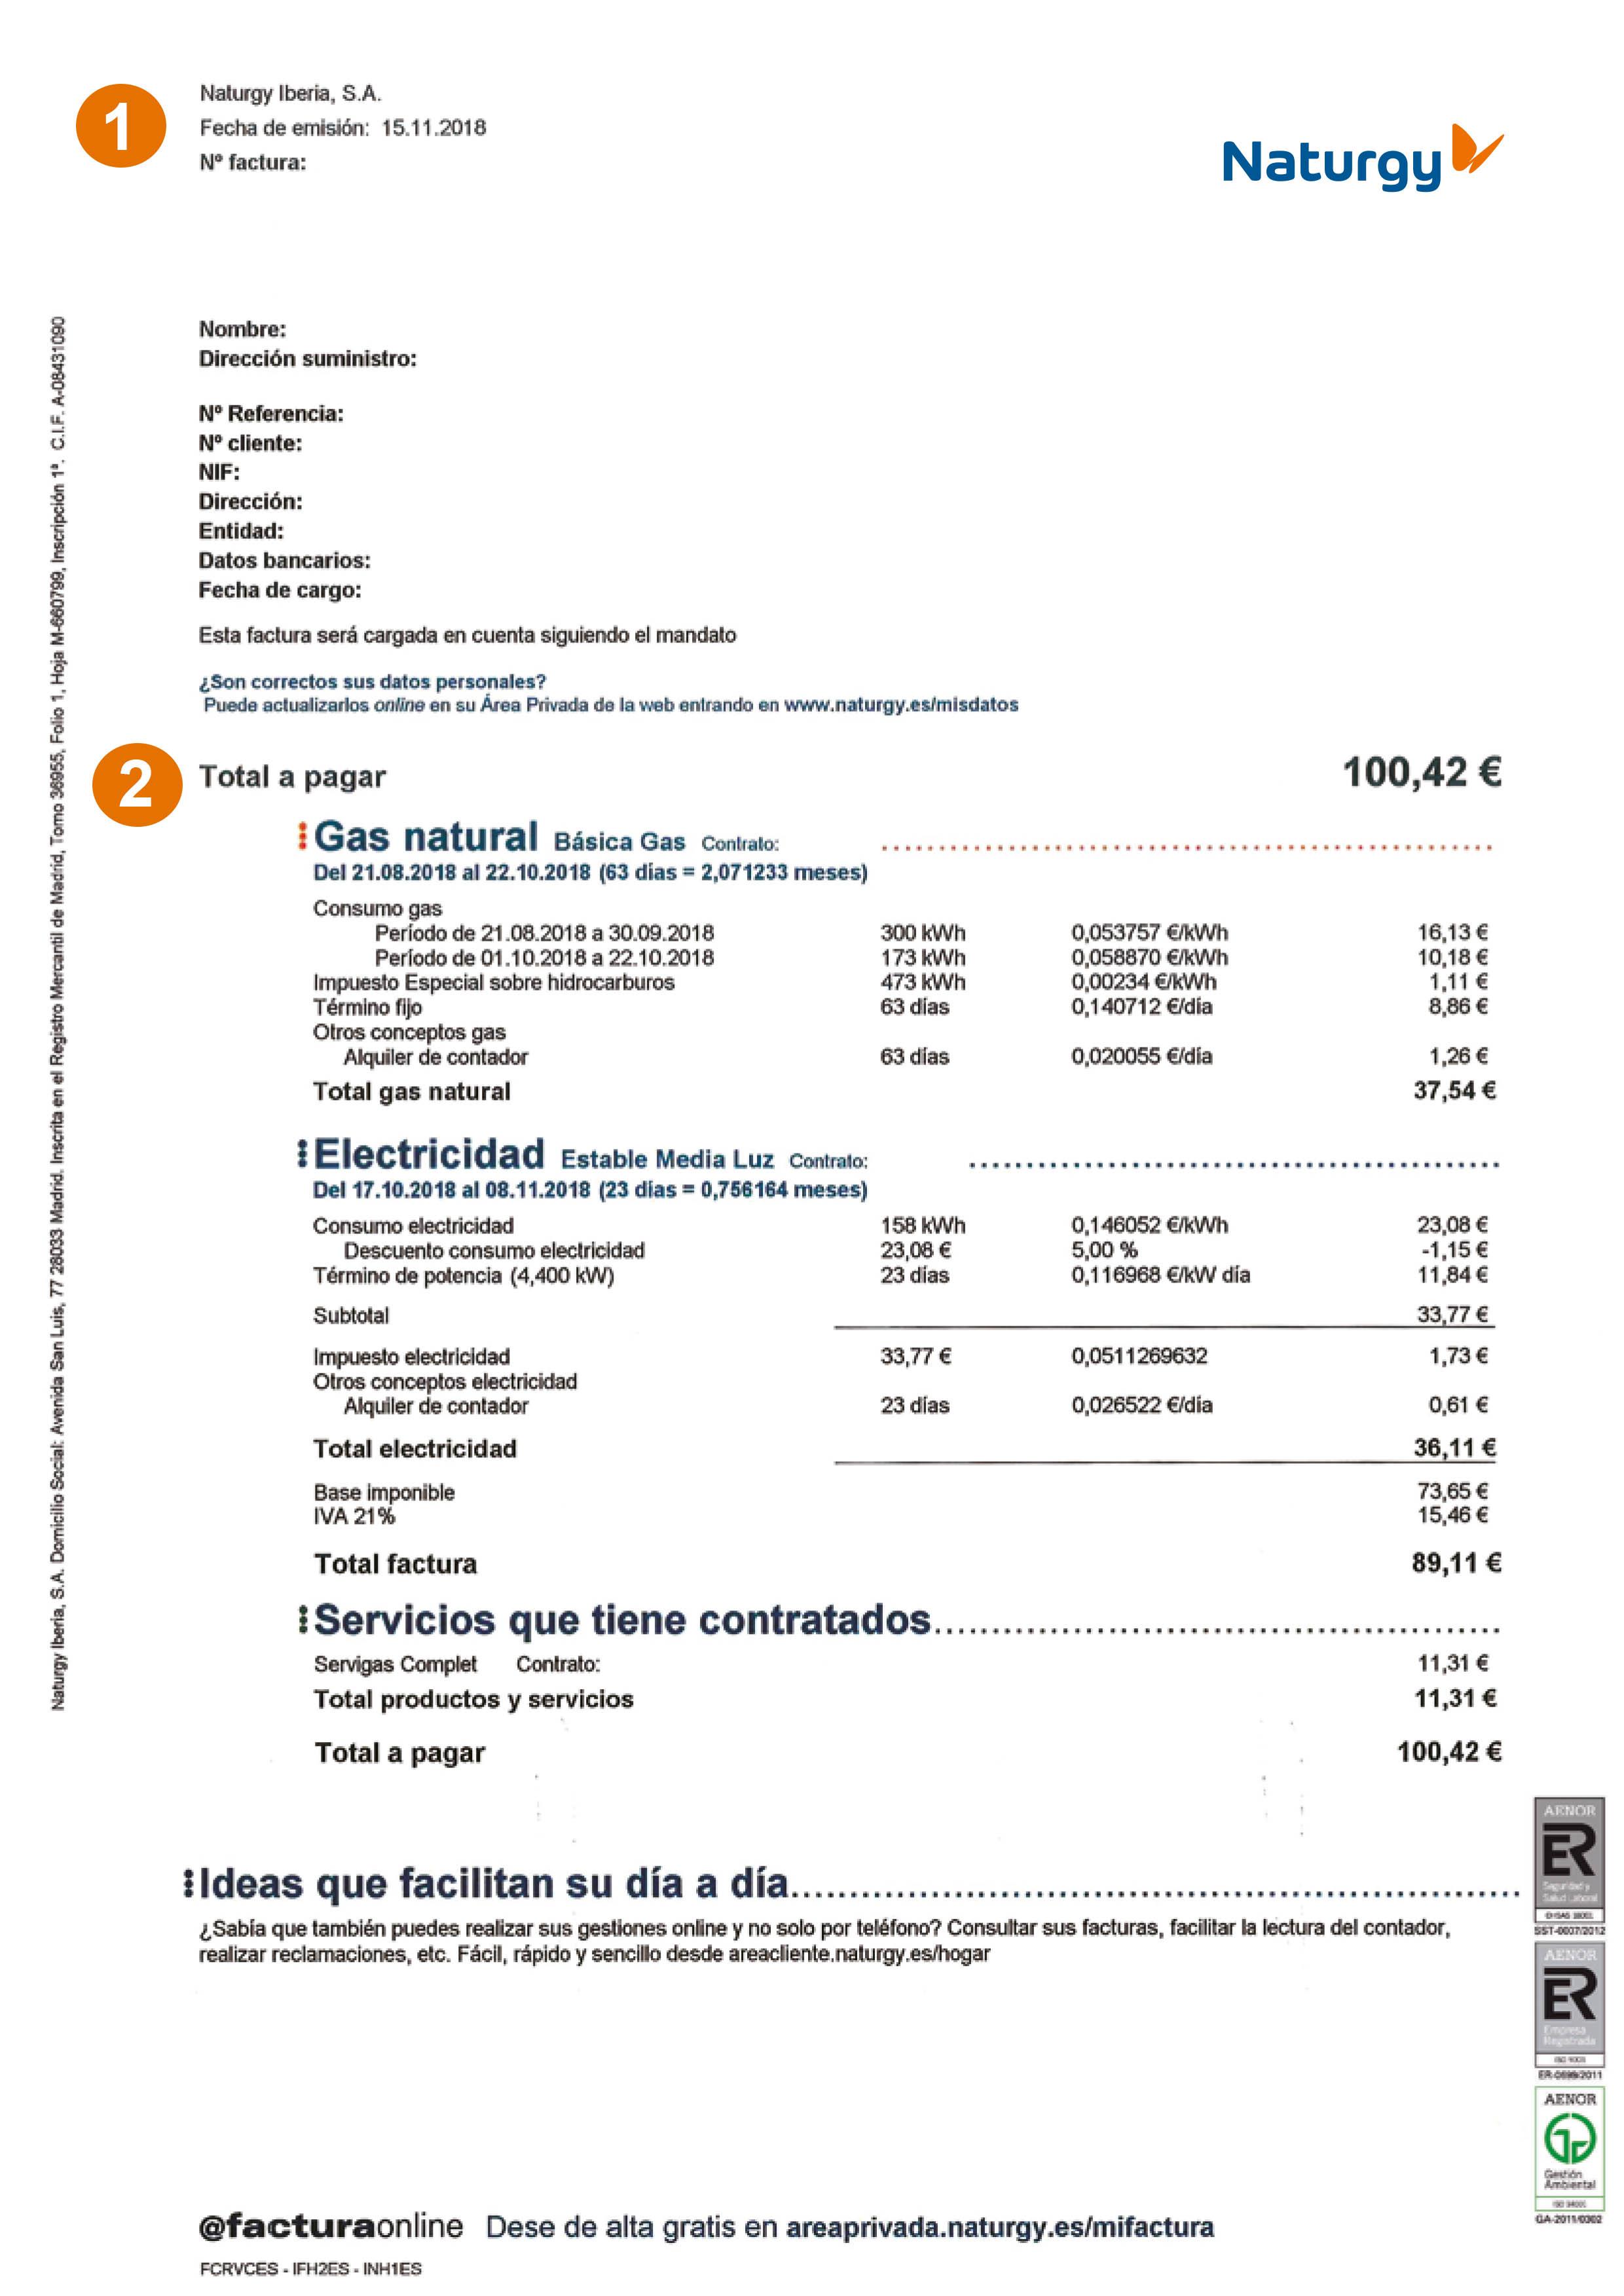 ff750e245 Entiende tu factura - Naturgy - Hogar